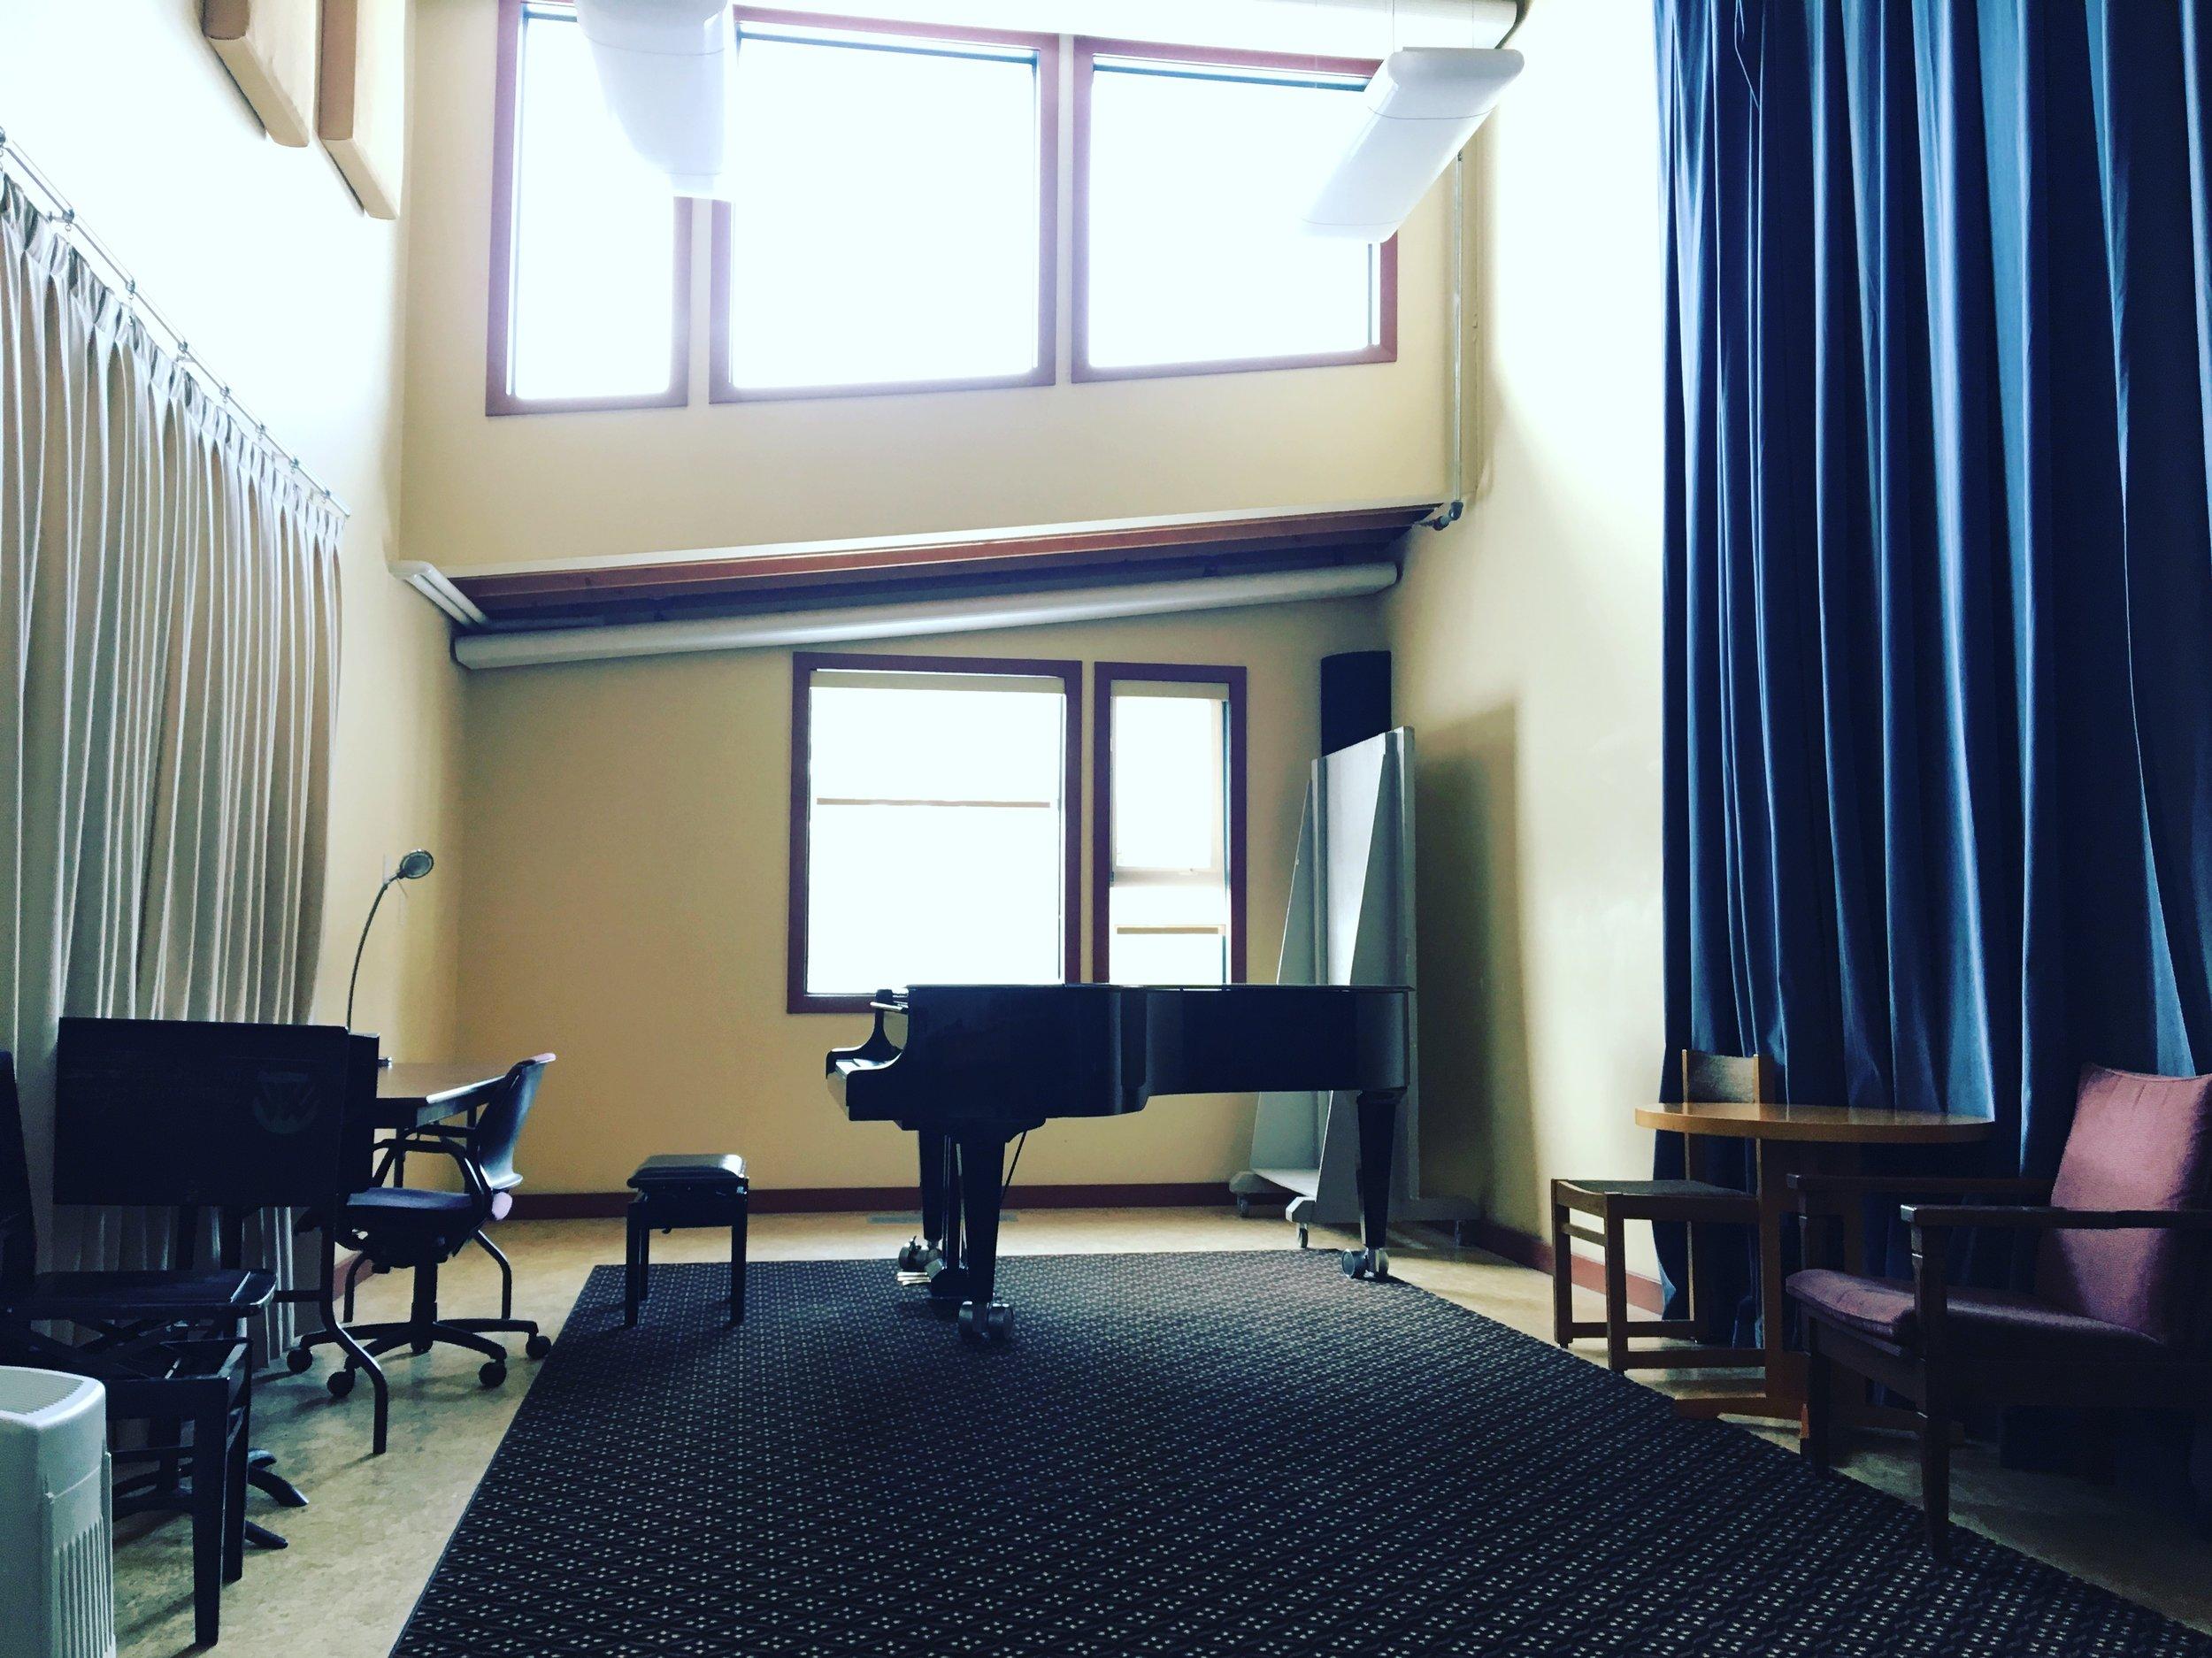 Our rehearsal studio